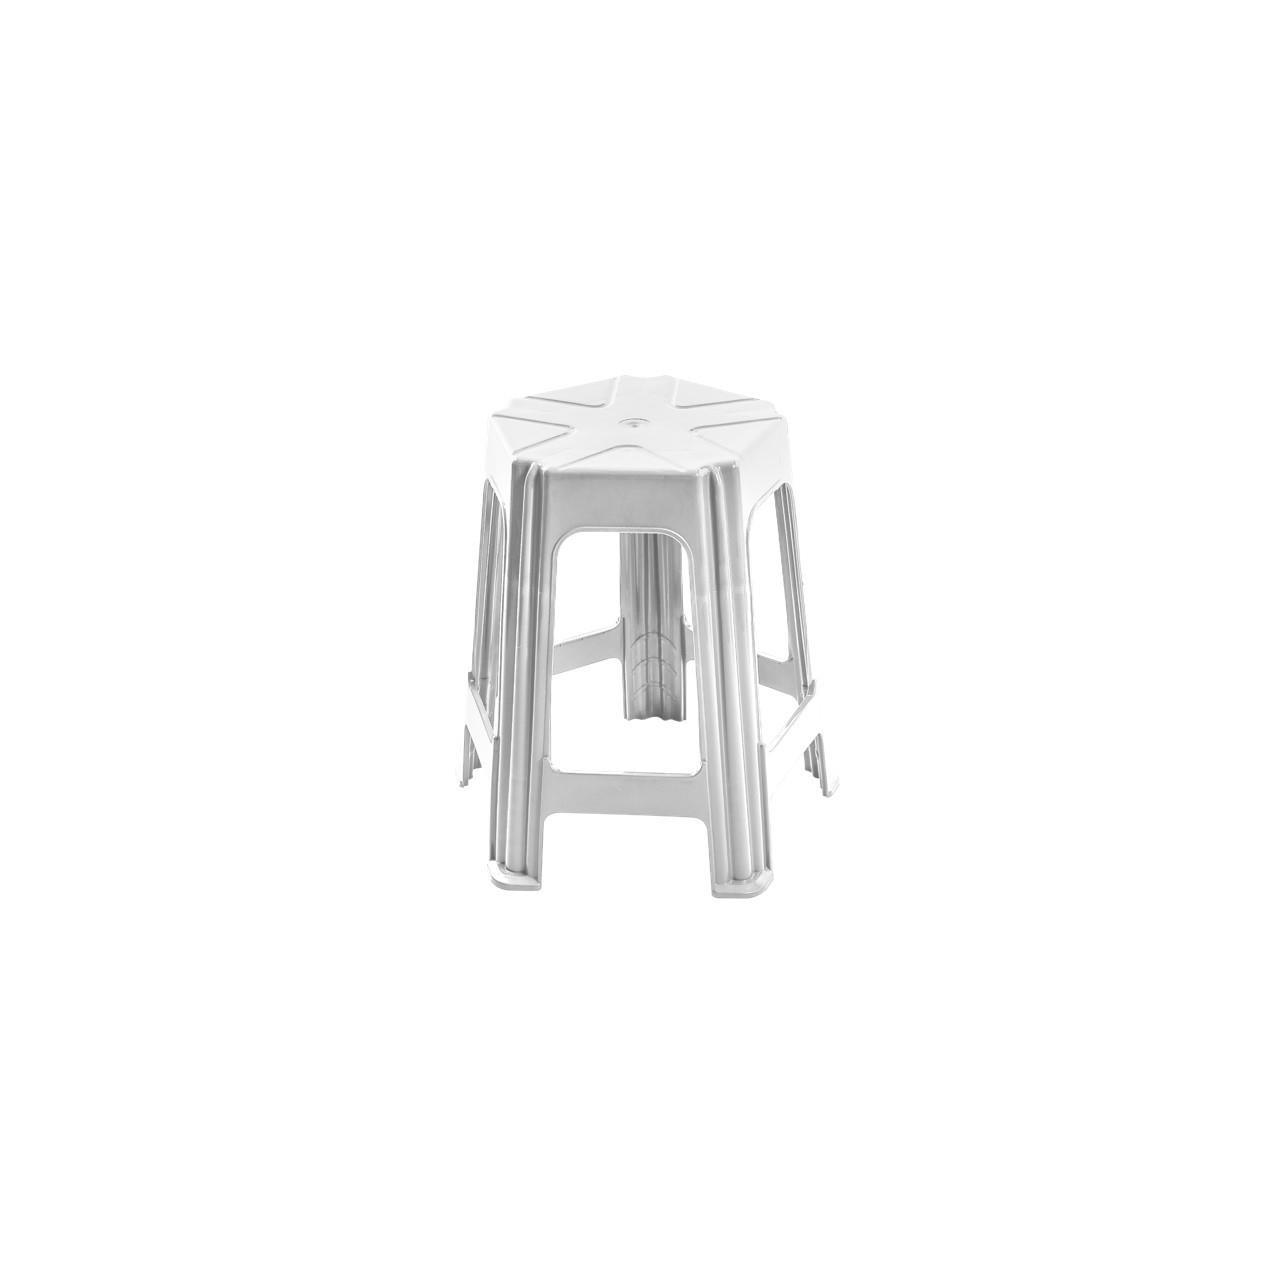 Banqueta Media 46cm Branca - Forte Plastico